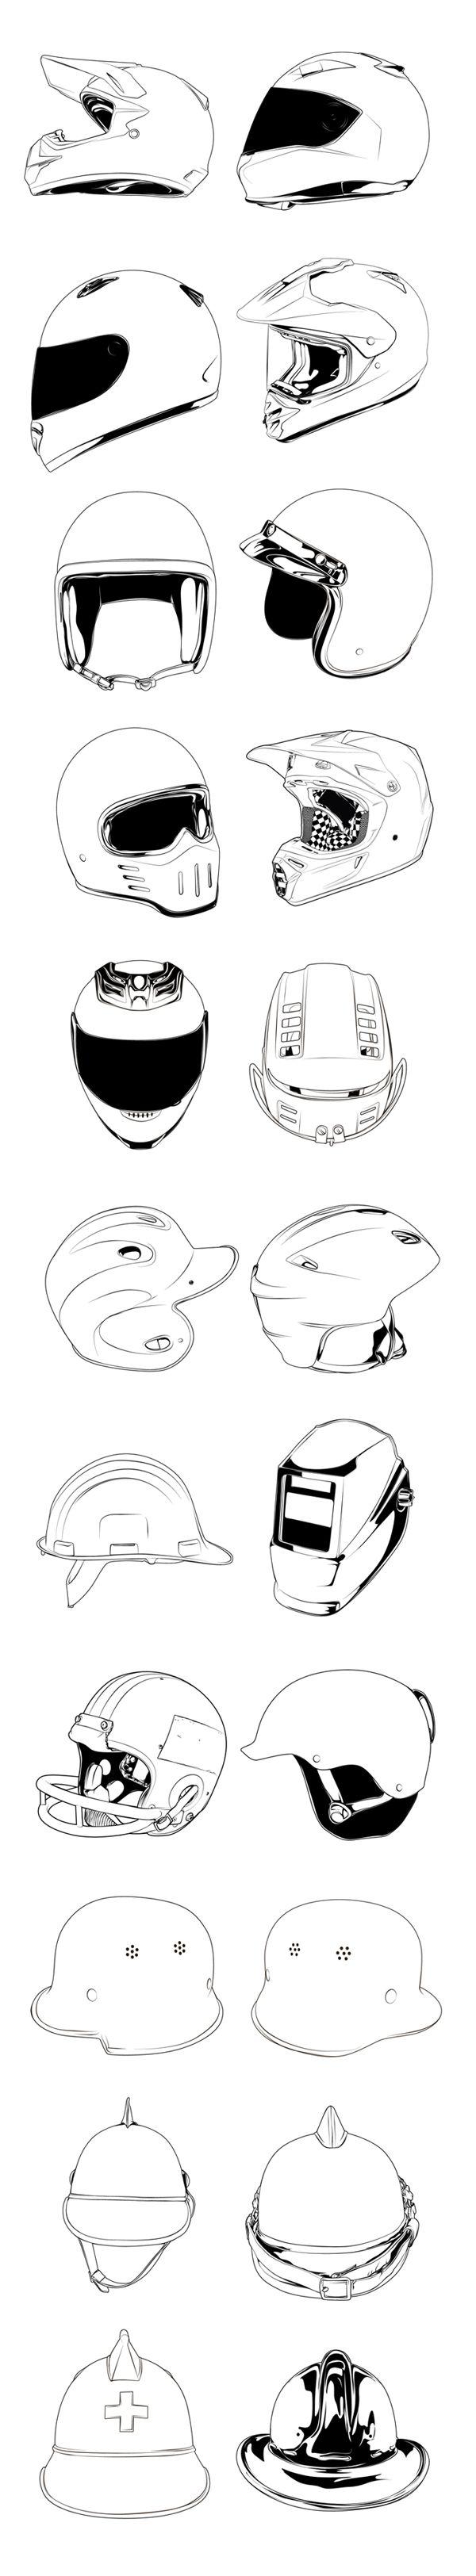 eps illustrations